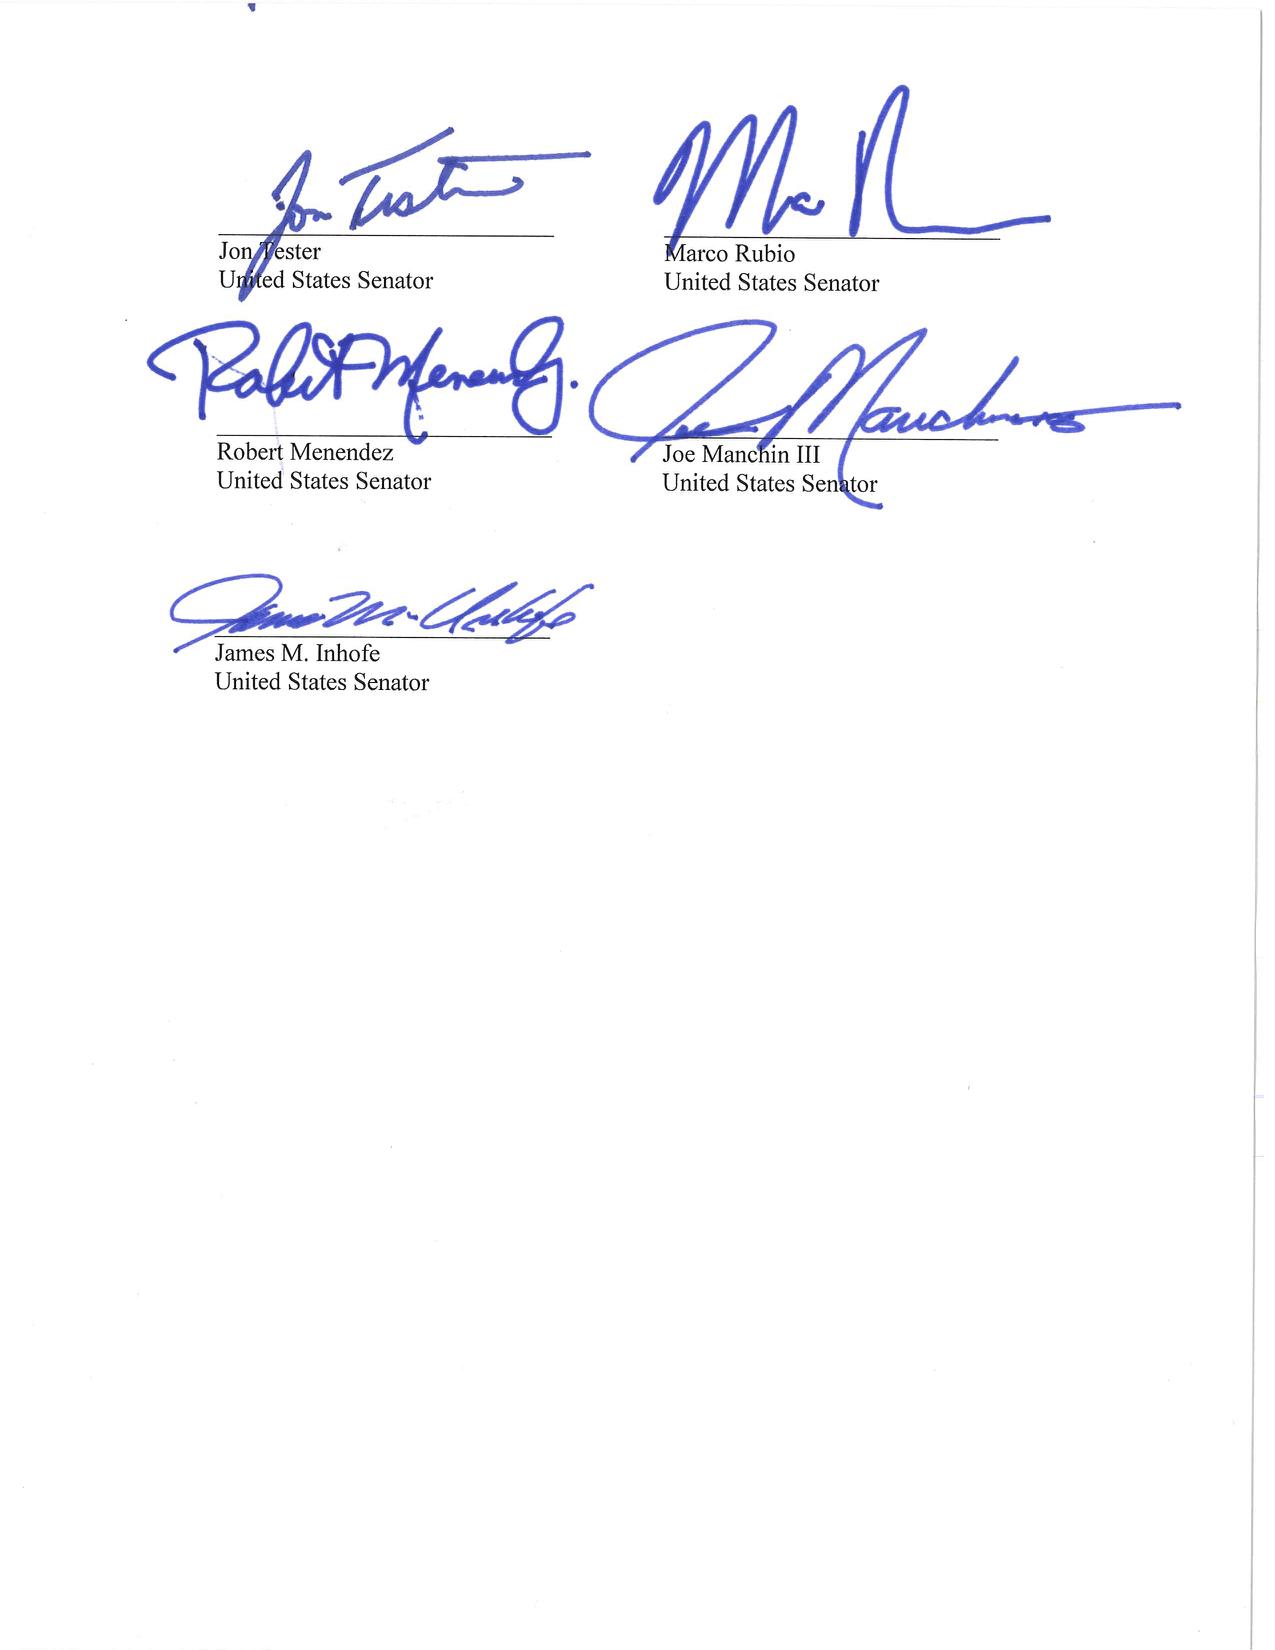 On June 7th, 2016, seven U.S. Senators questioned the Food and Drug Administration's (FDA) regulation of premium cigars.